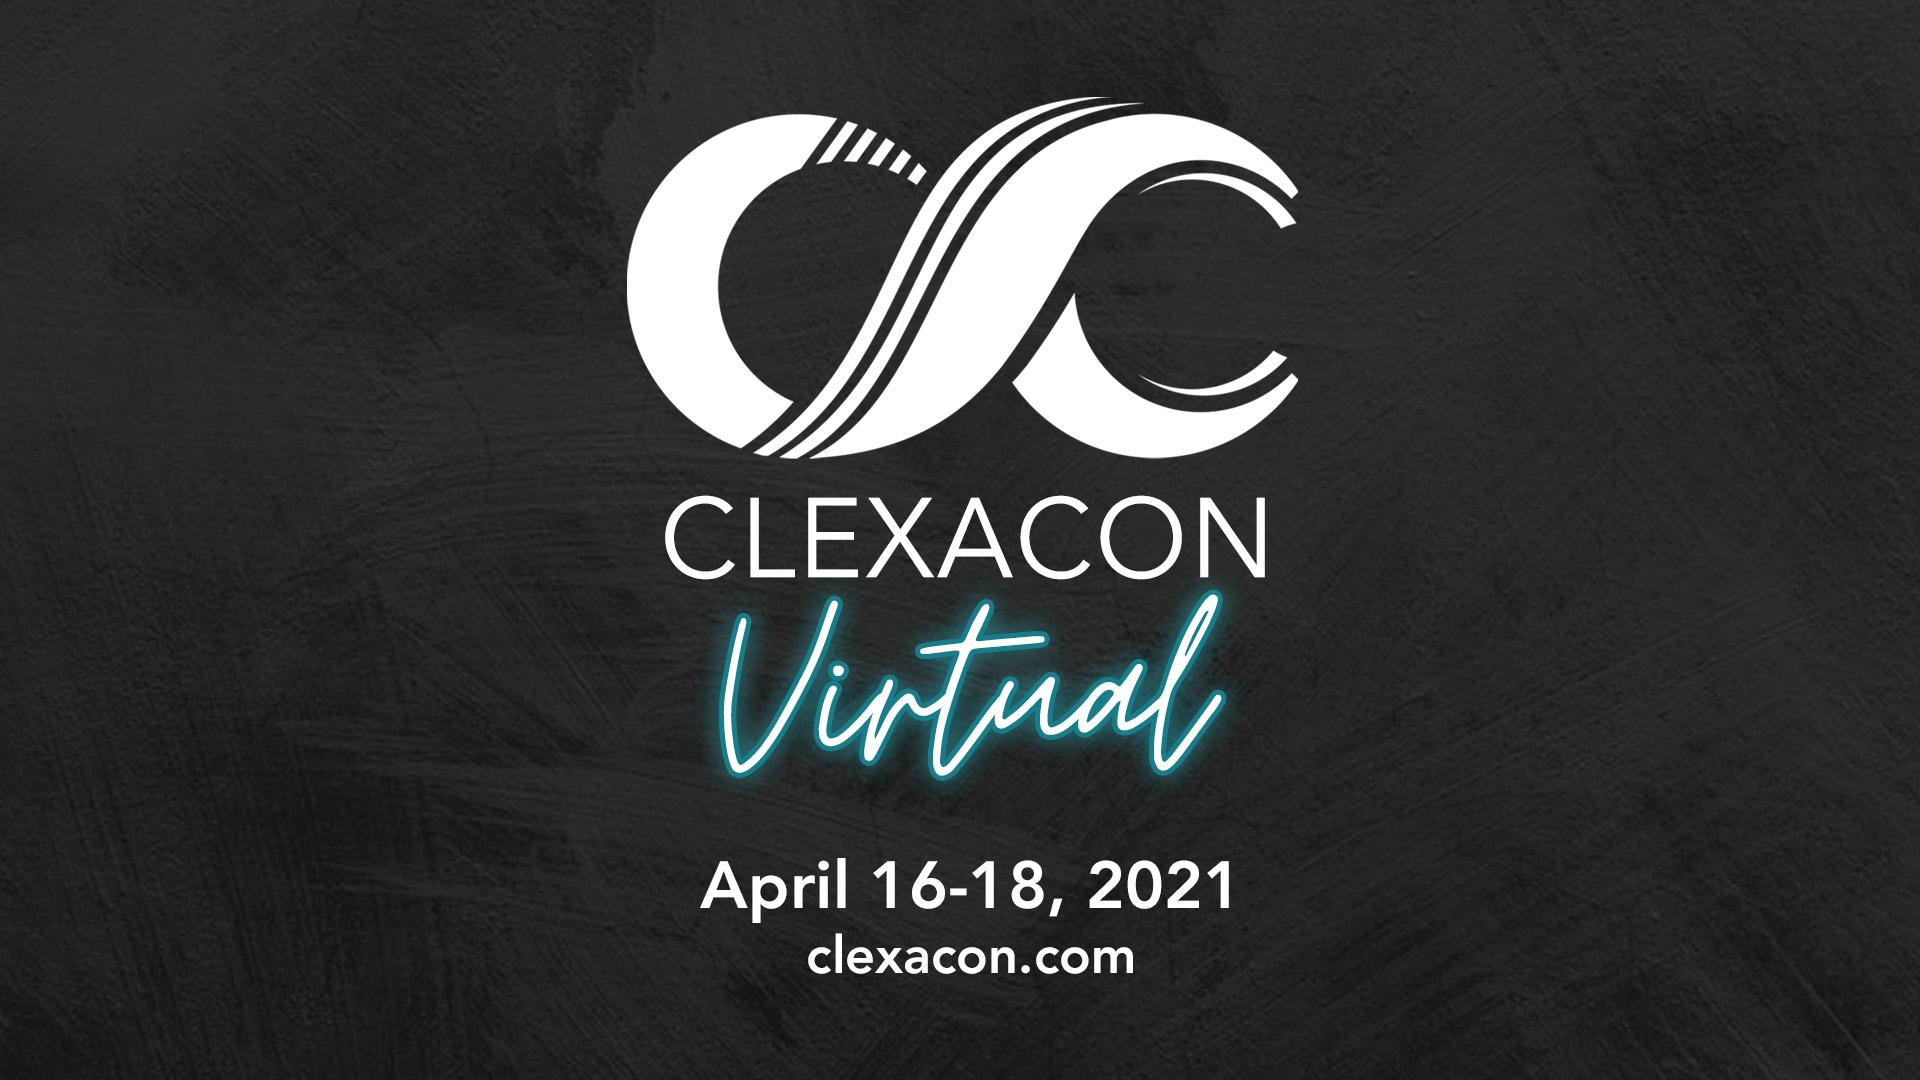 Photo for ClexaCon Virtual 2021 on ViewStub